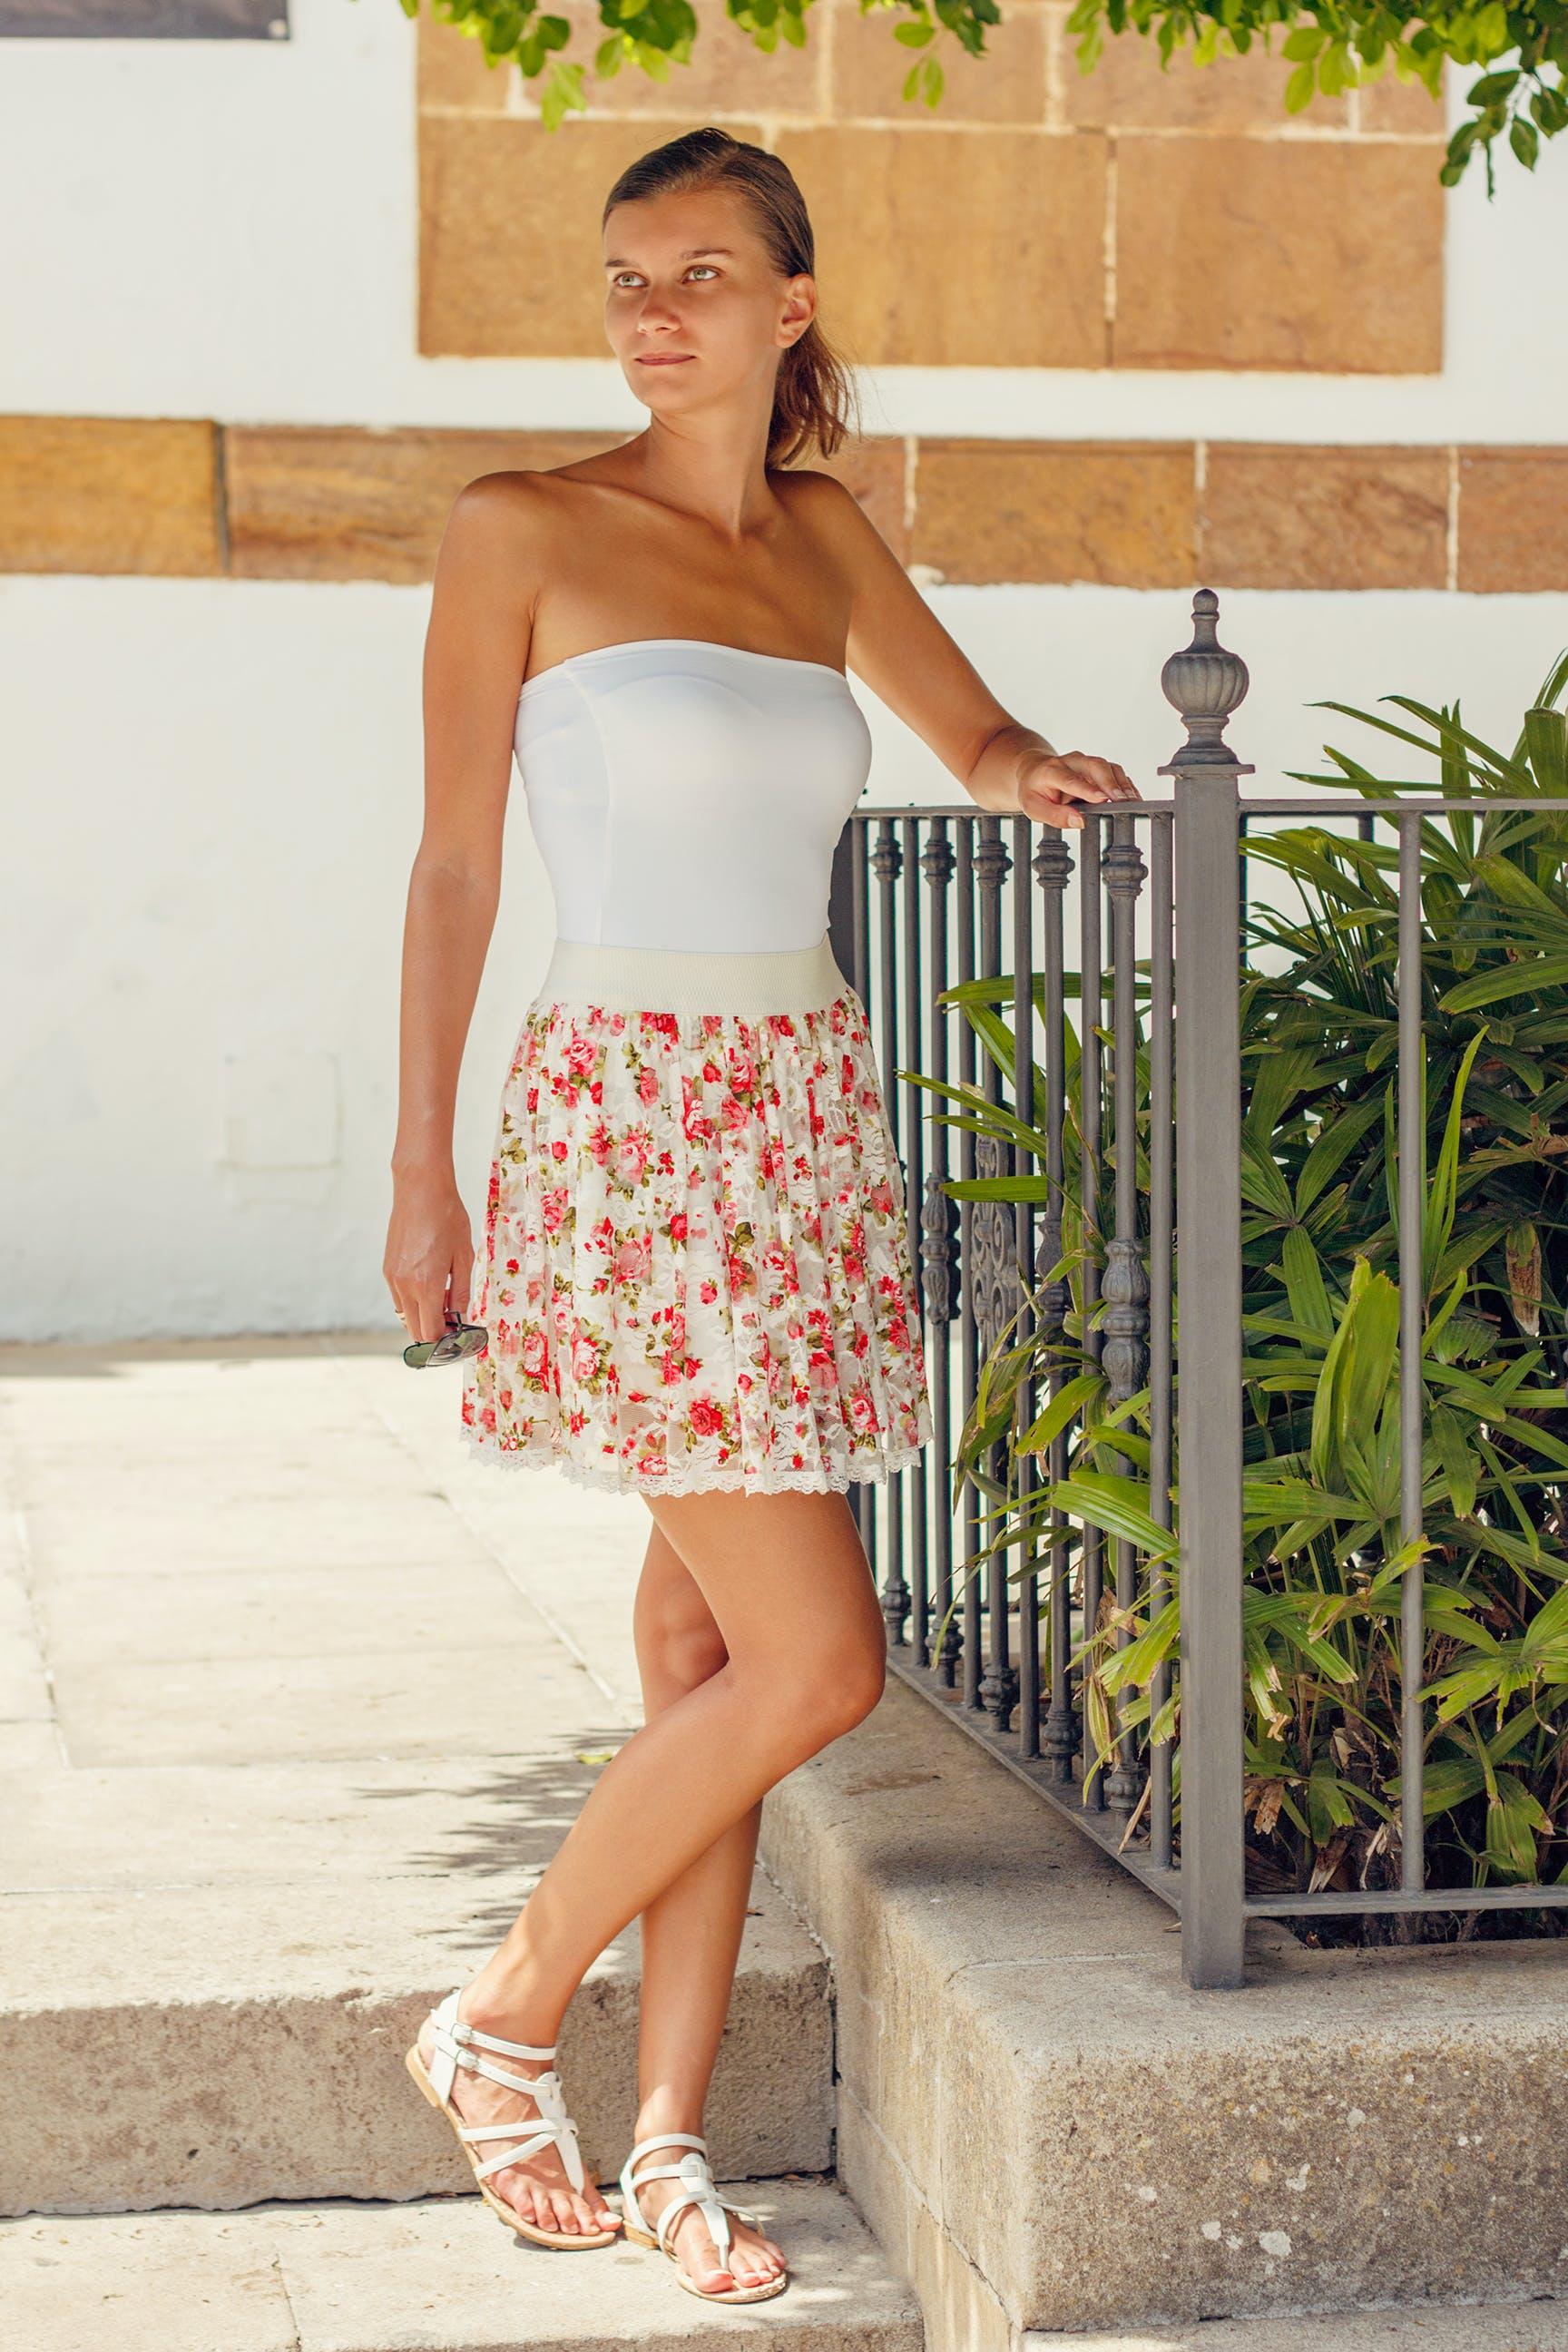 Kostenloses Stock Foto zu dame, draußen, fashion, frau